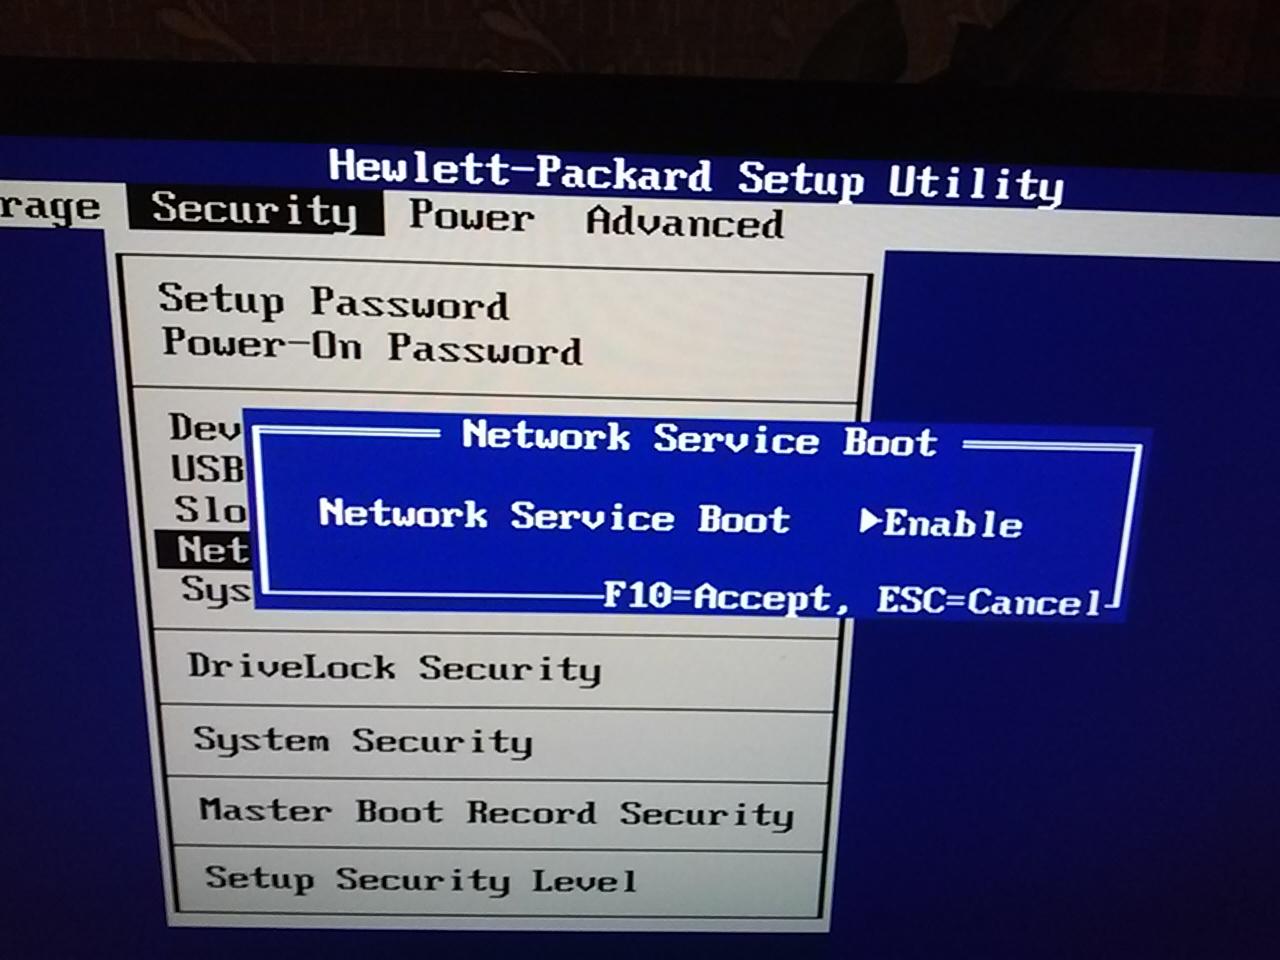 hp compaq elite 8000 sff wake on lan don't work - HP Support